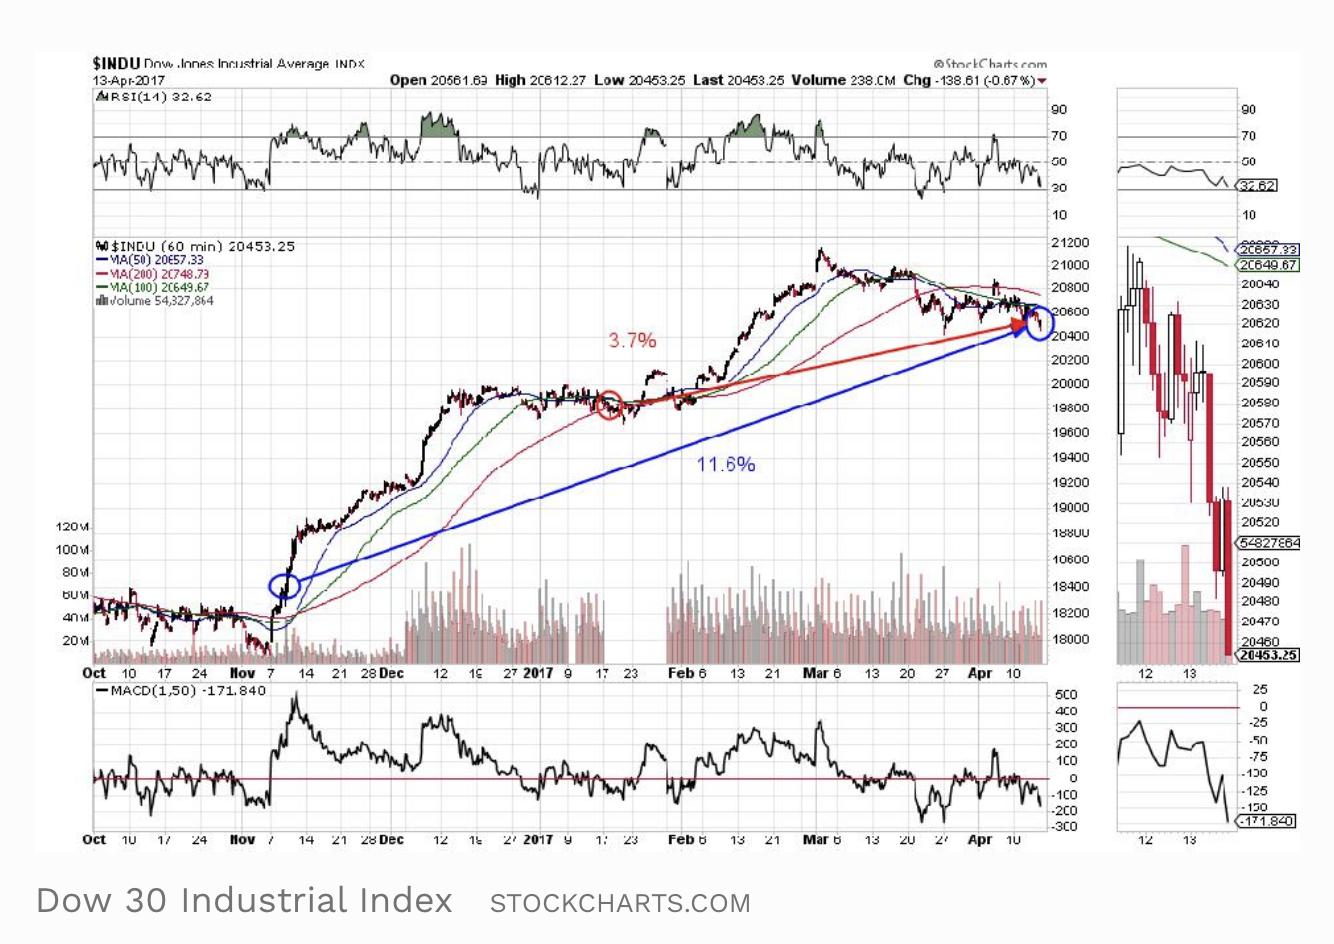 Screen-Shot-2021-04-19-at-3.31.27-PM Stock Market Under Biden Surges Past Trump As GOP Implodes Economy Featured Politics Stock Market Top Stories